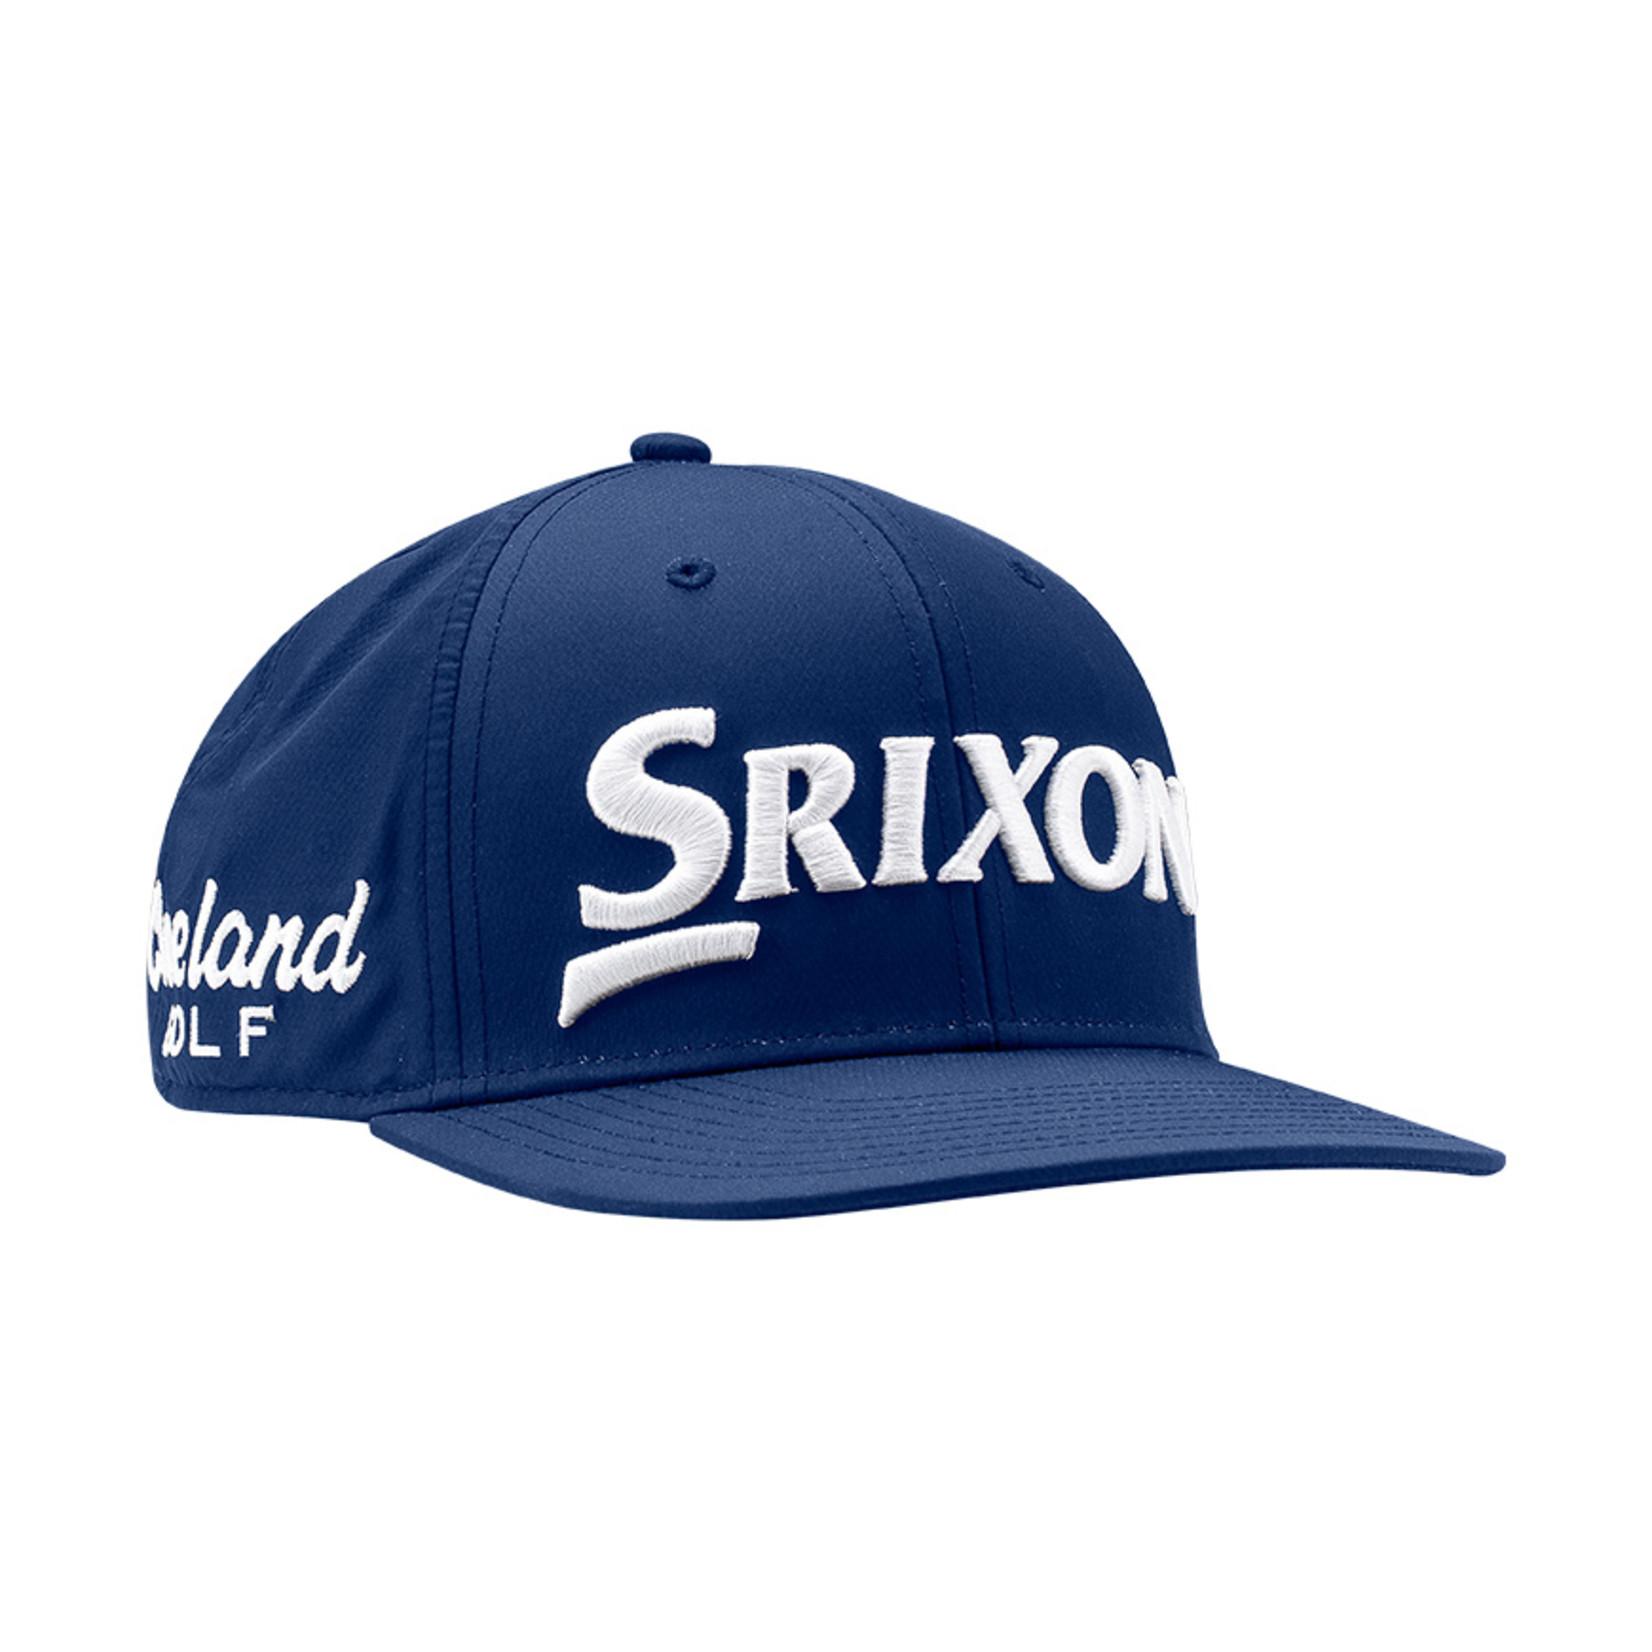 Srixon Srixon Tour Original Golf Hat